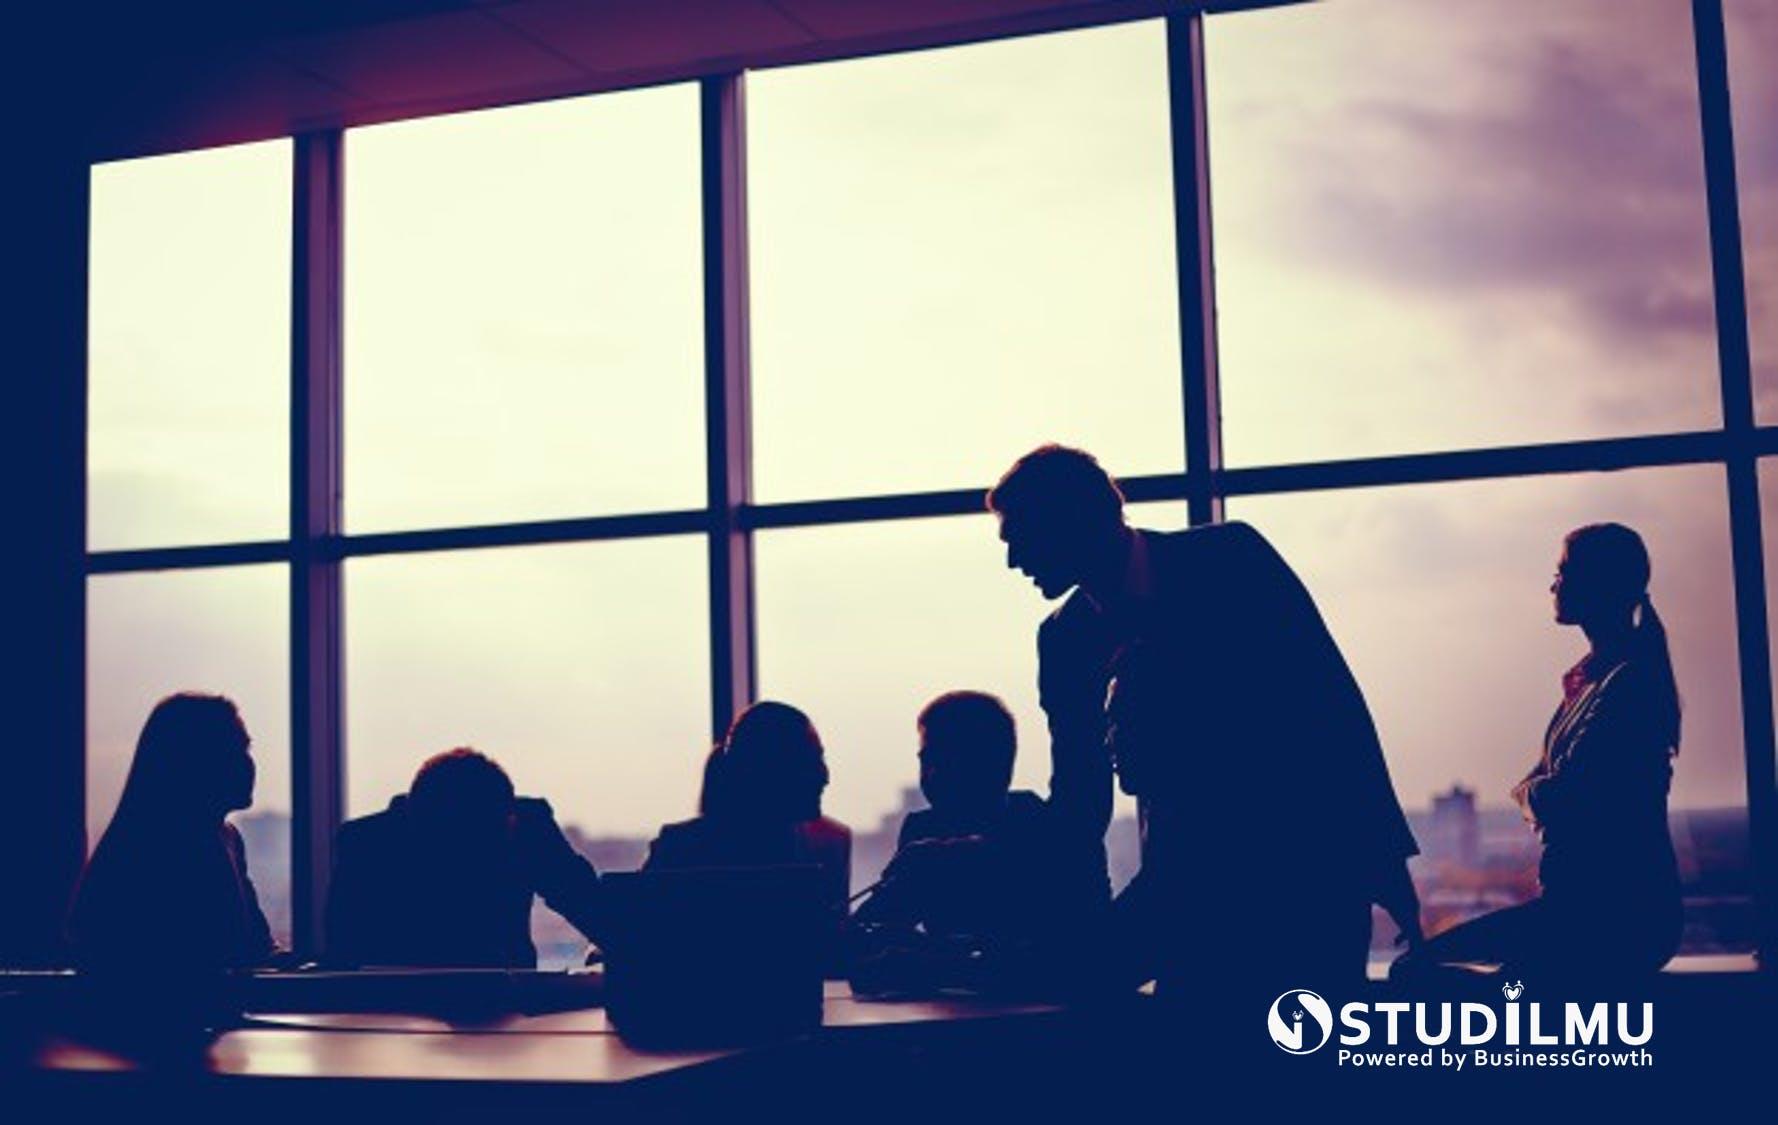 STUDILMU Career Advice - 8 Cara Membuat Rapat Kerja Lebih Menyenangkan